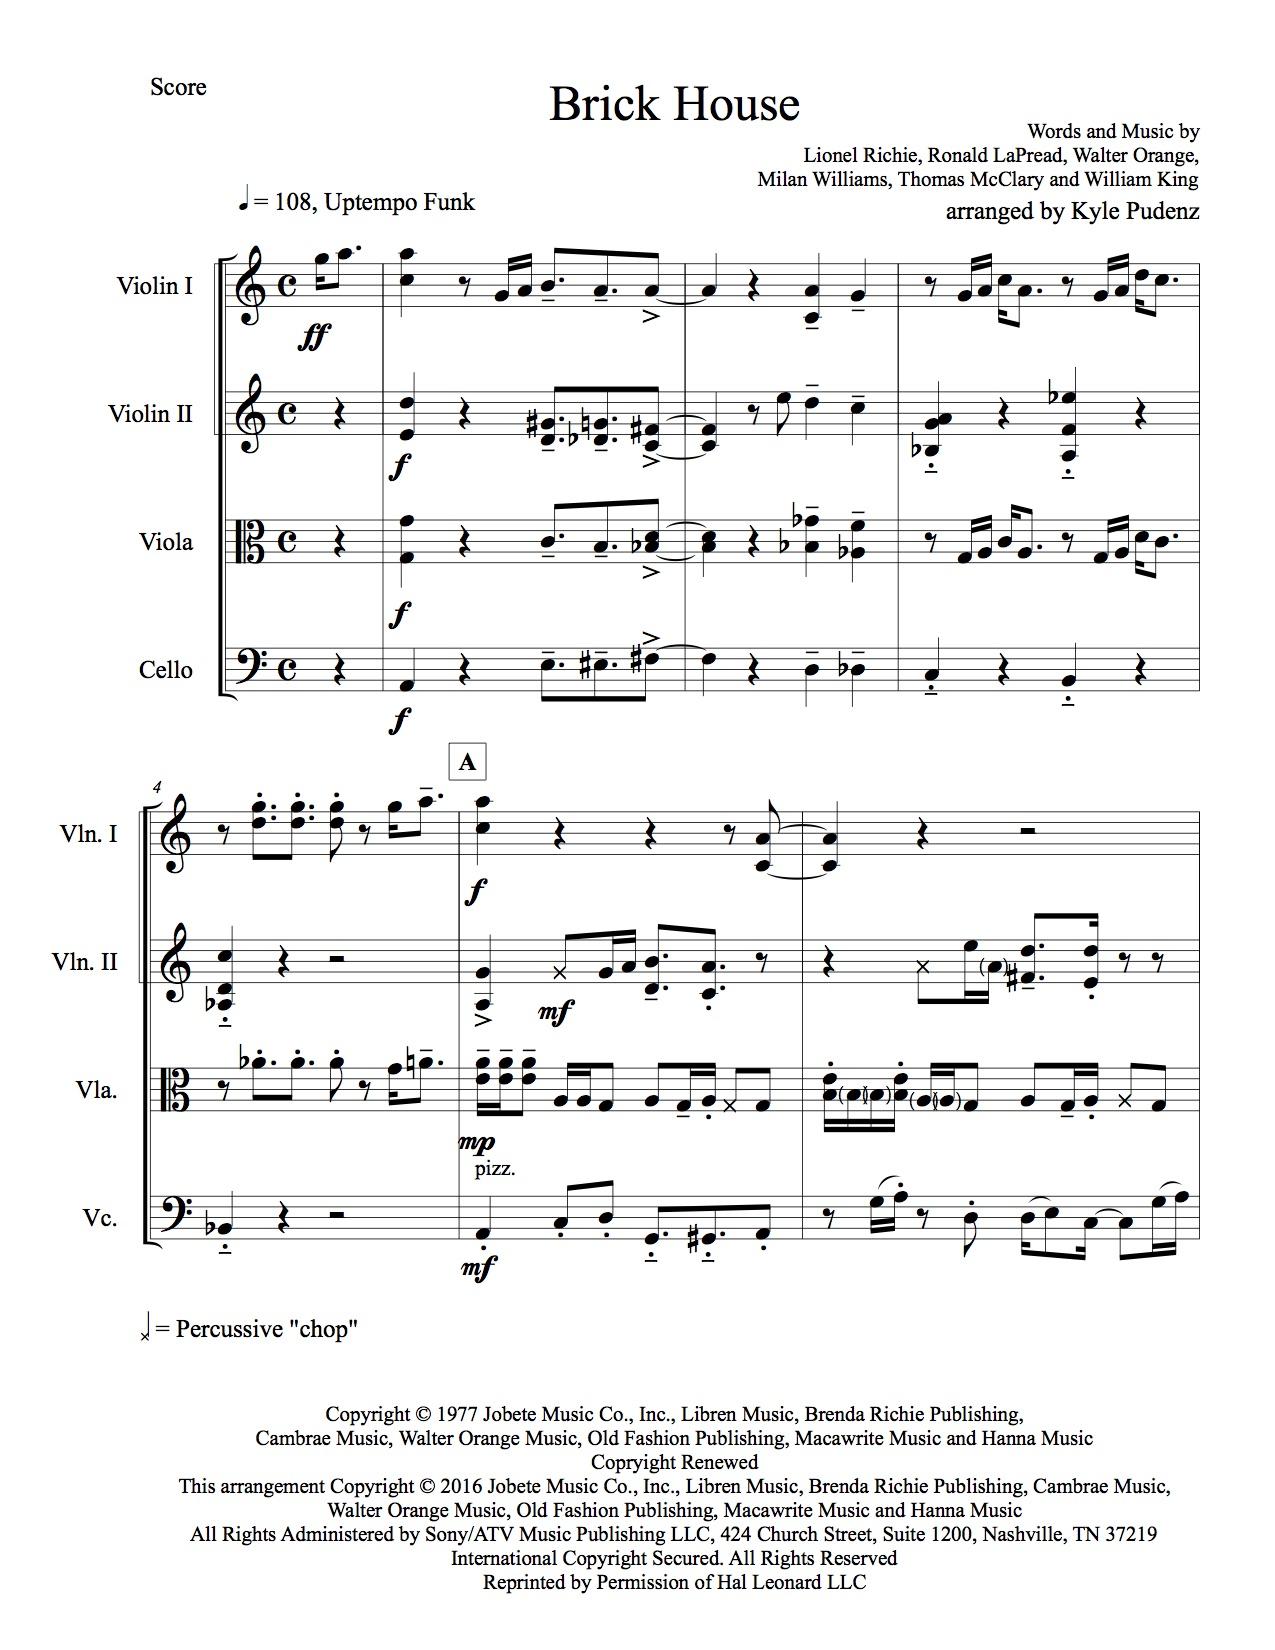 Commodores - Brick House for Jazz String Quartet — Kyle Pudenz